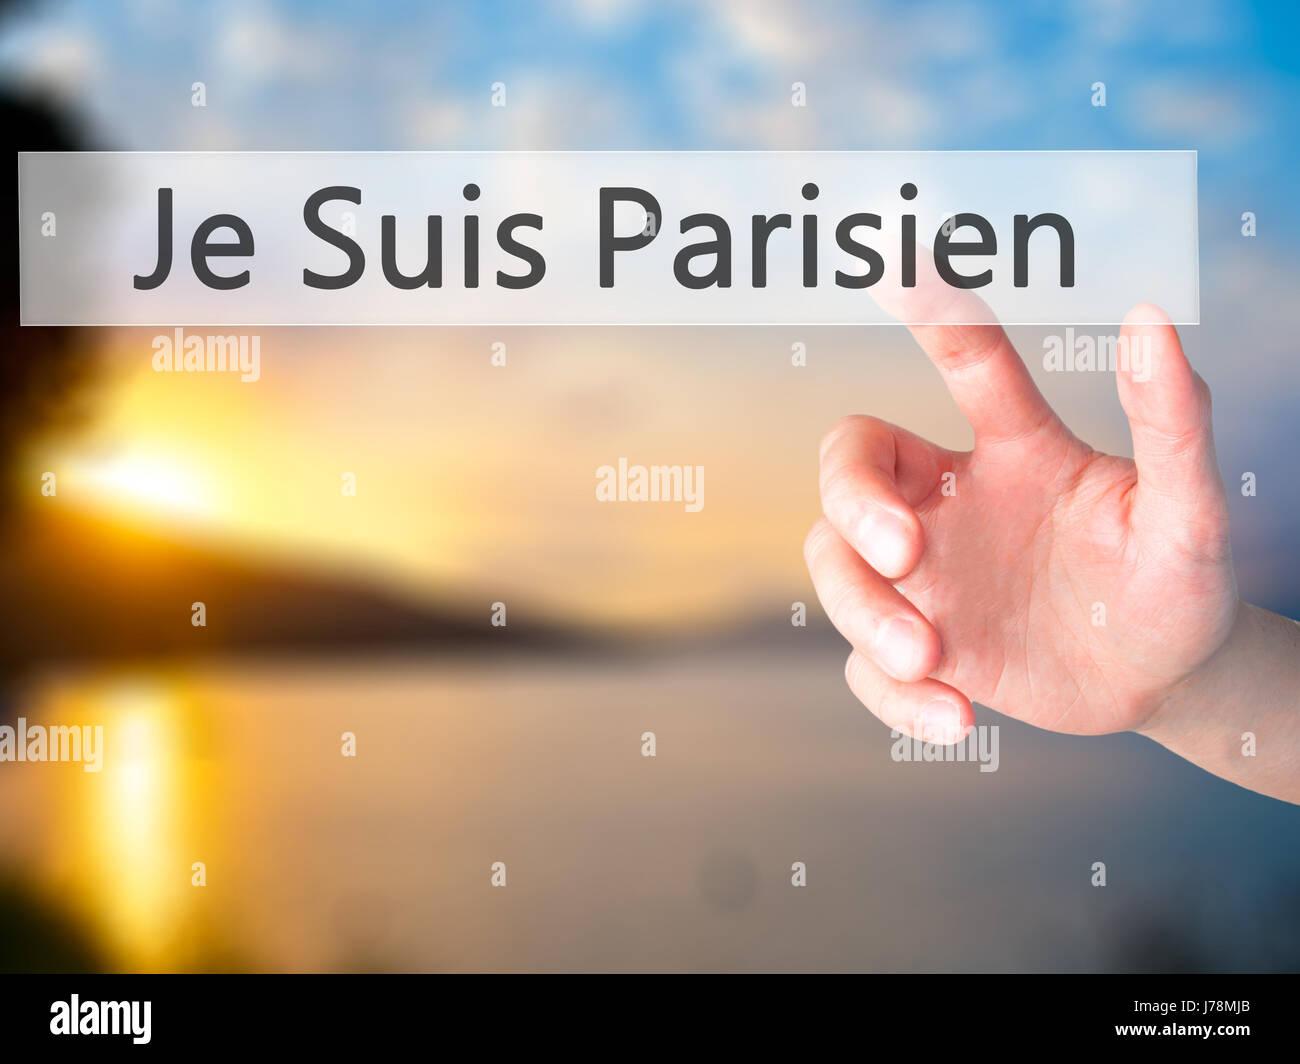 Je Suis Parisien ( I am Parisien)  - Hand pressing a button on blurred background concept . Business, technology, Stock Photo